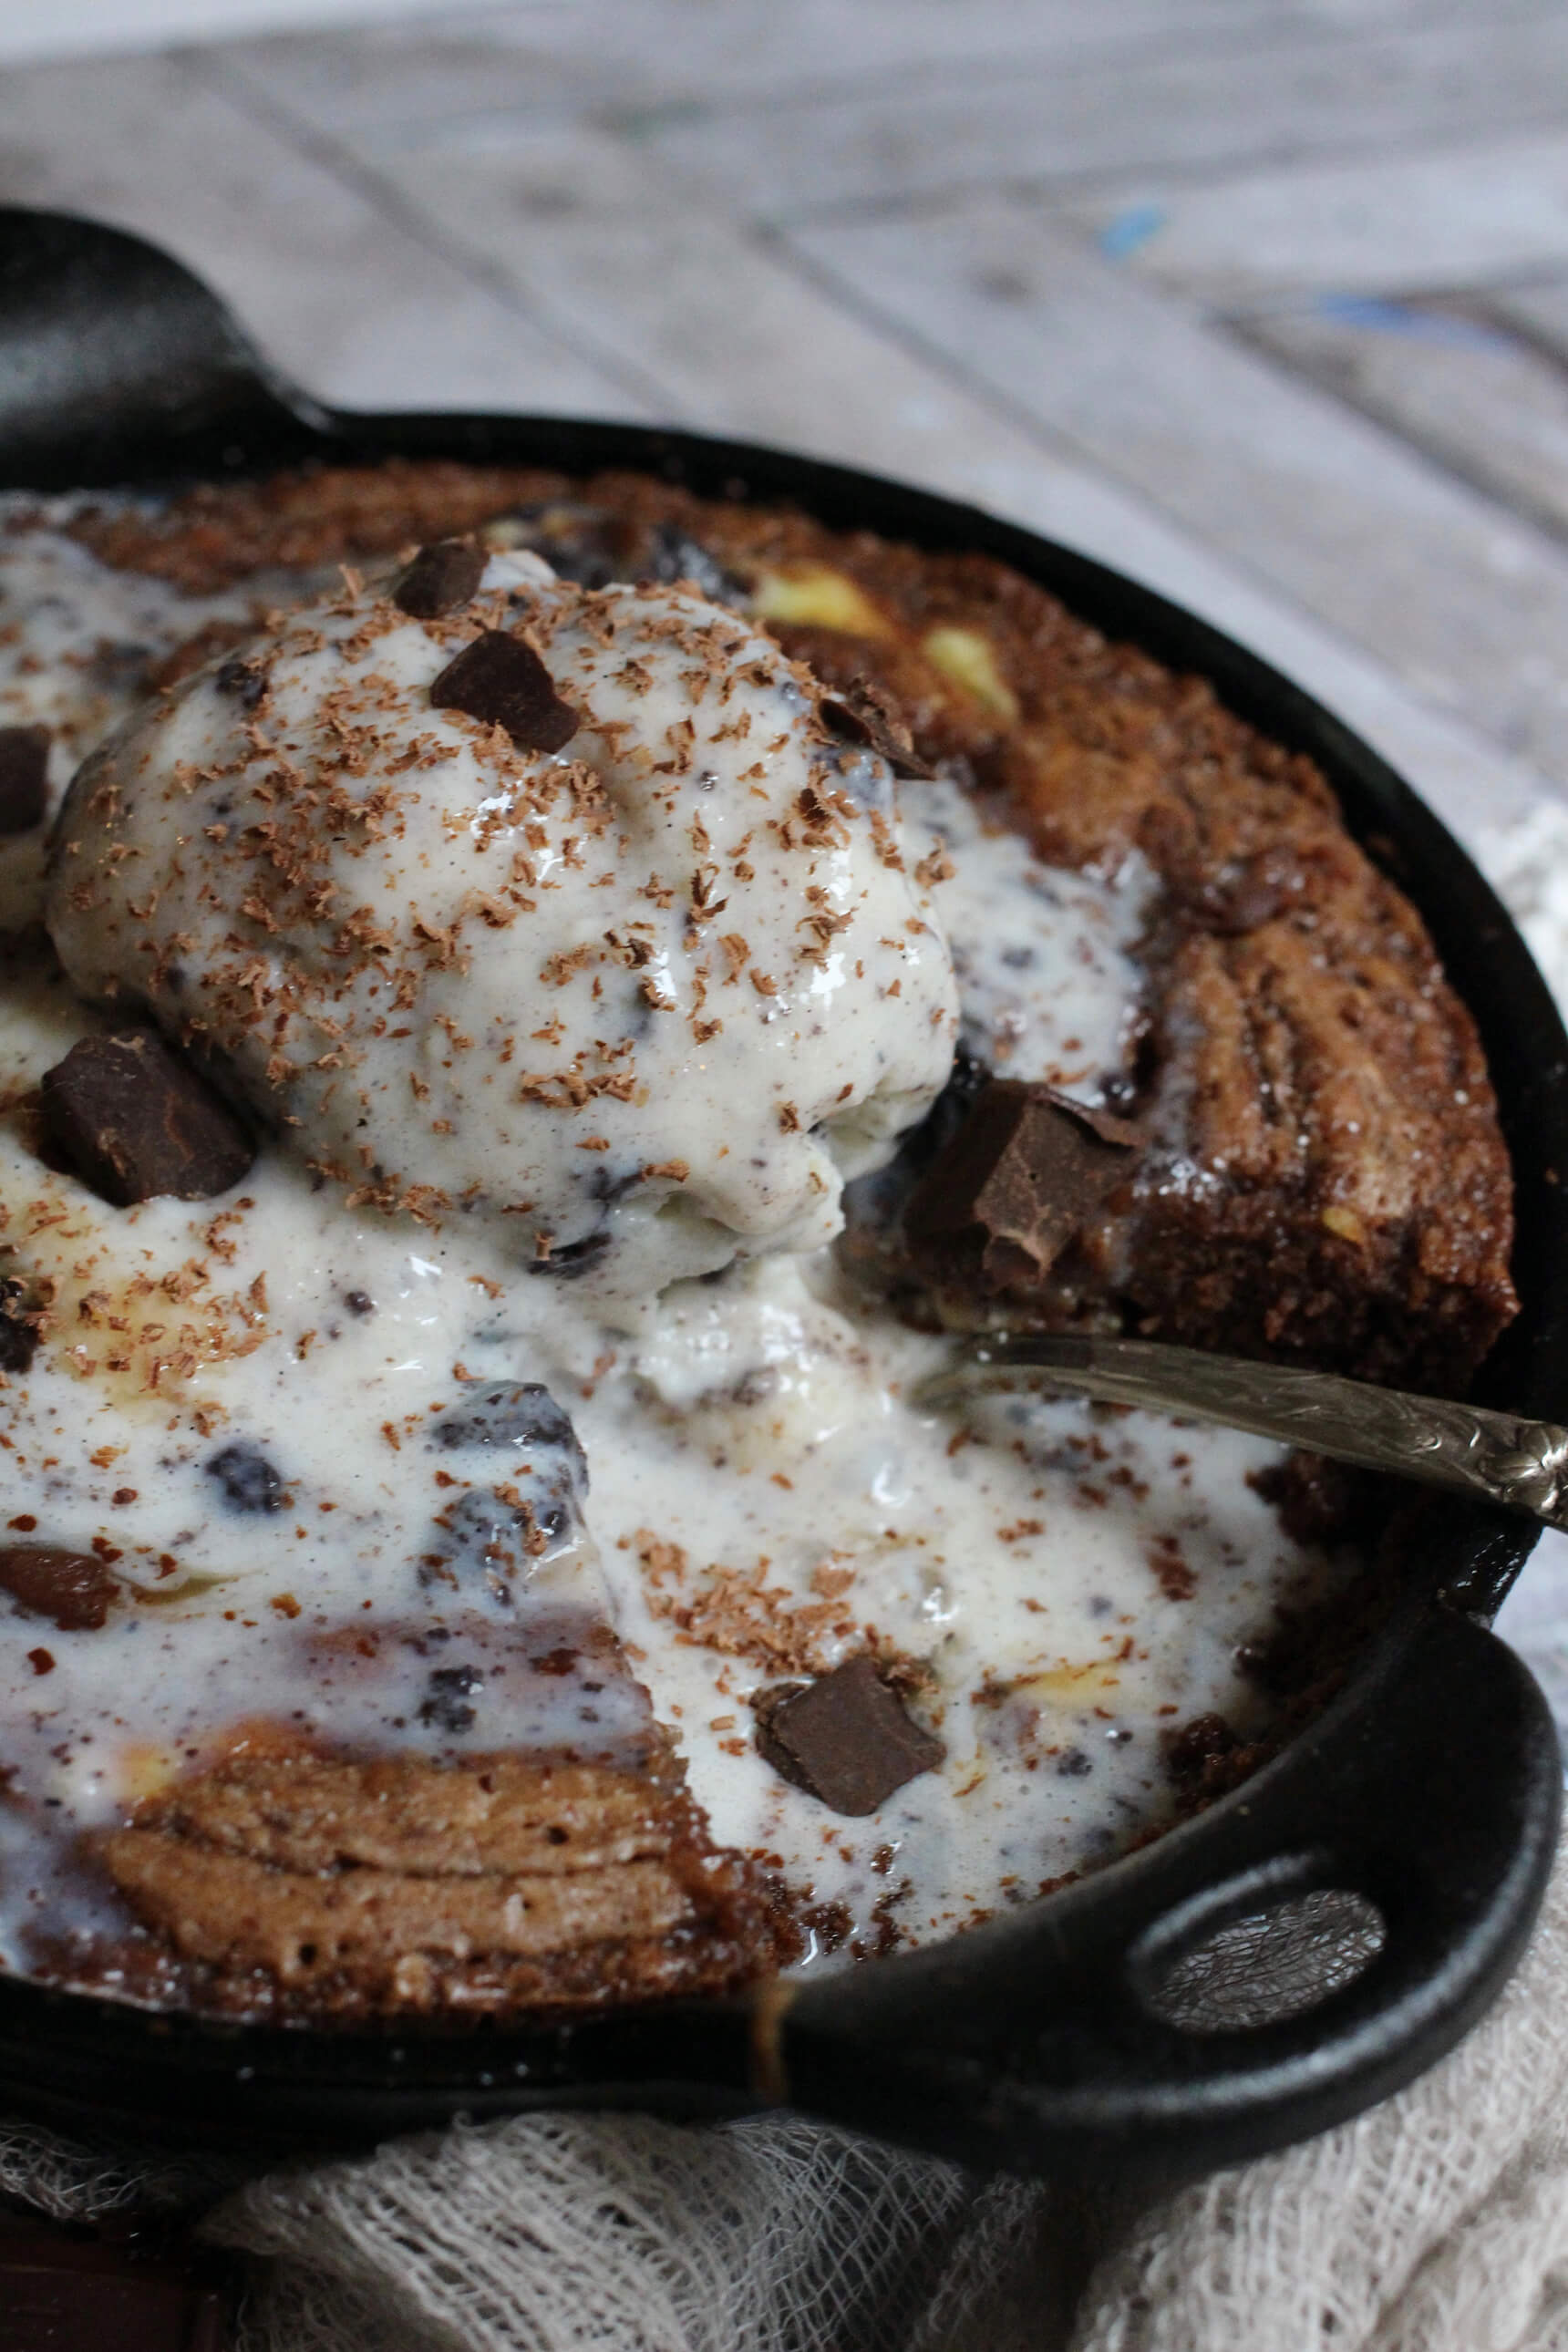 Skillet Marbled Brownie A La Mode